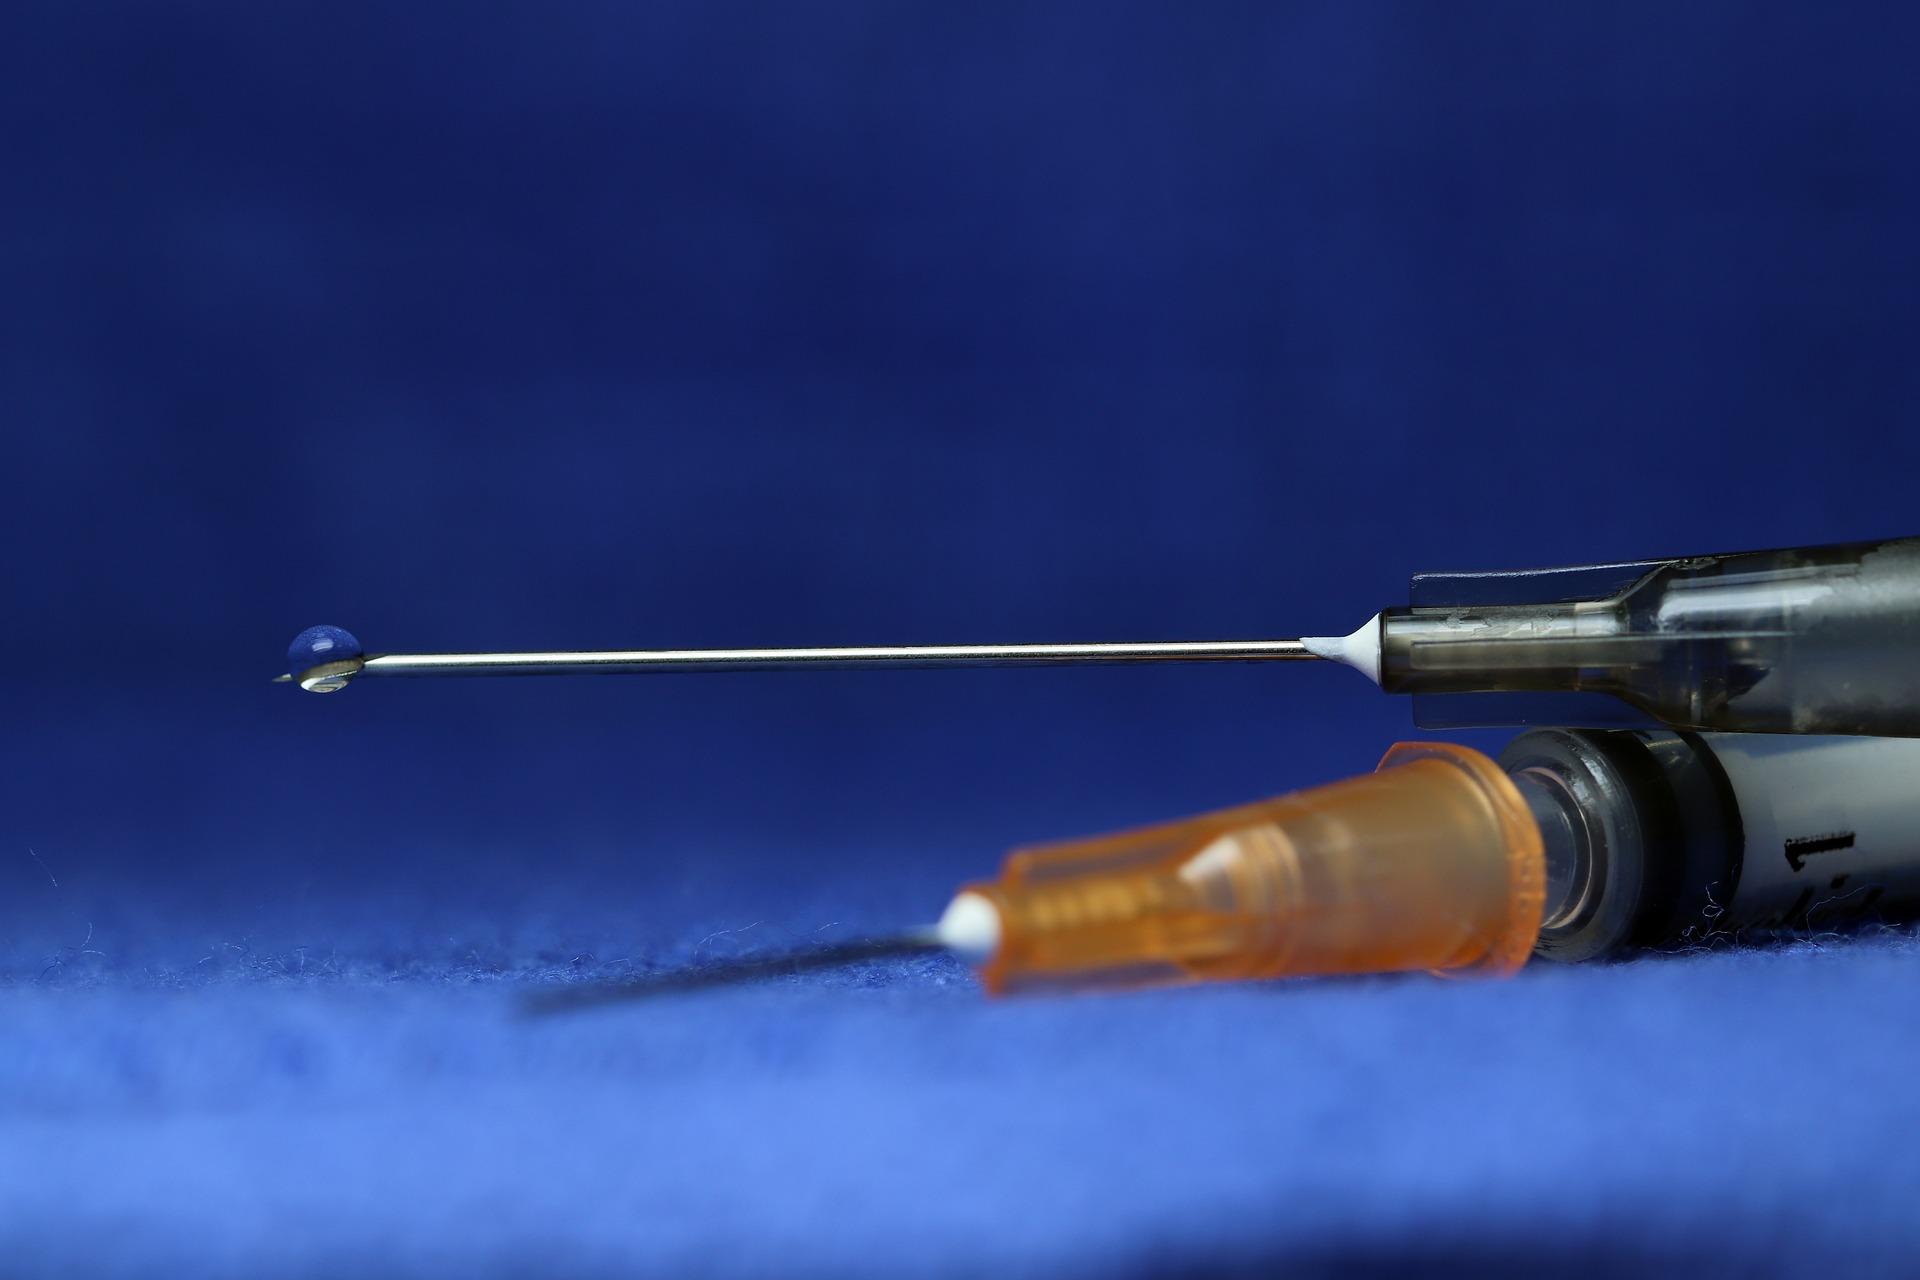 syringe-3908157_1920.jpg